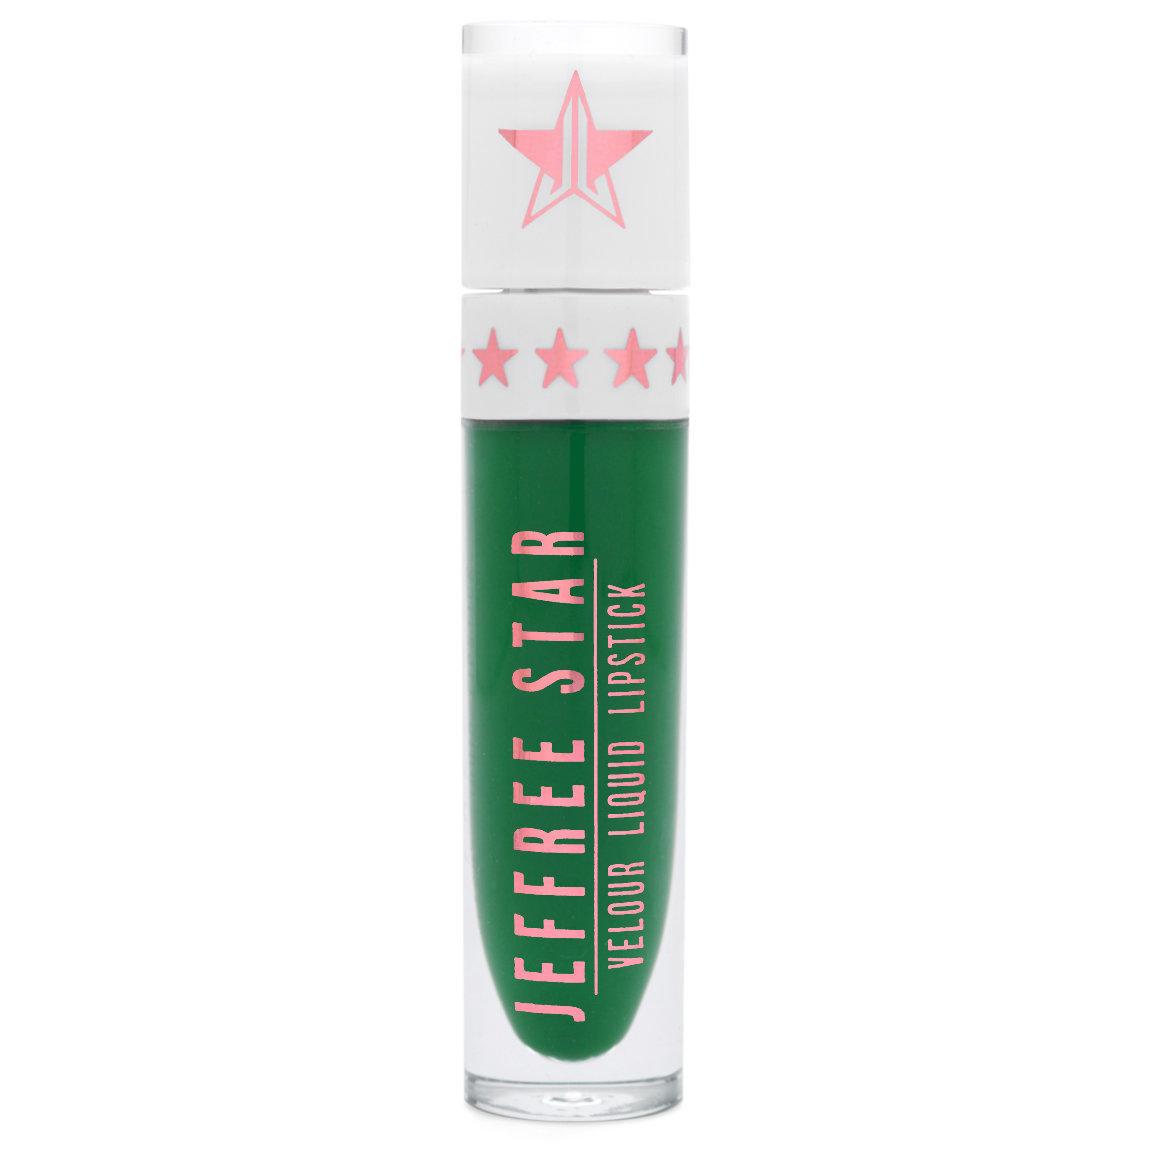 Jeffree Star Cosmetics Velour Liquid Lipstick Mistletoe